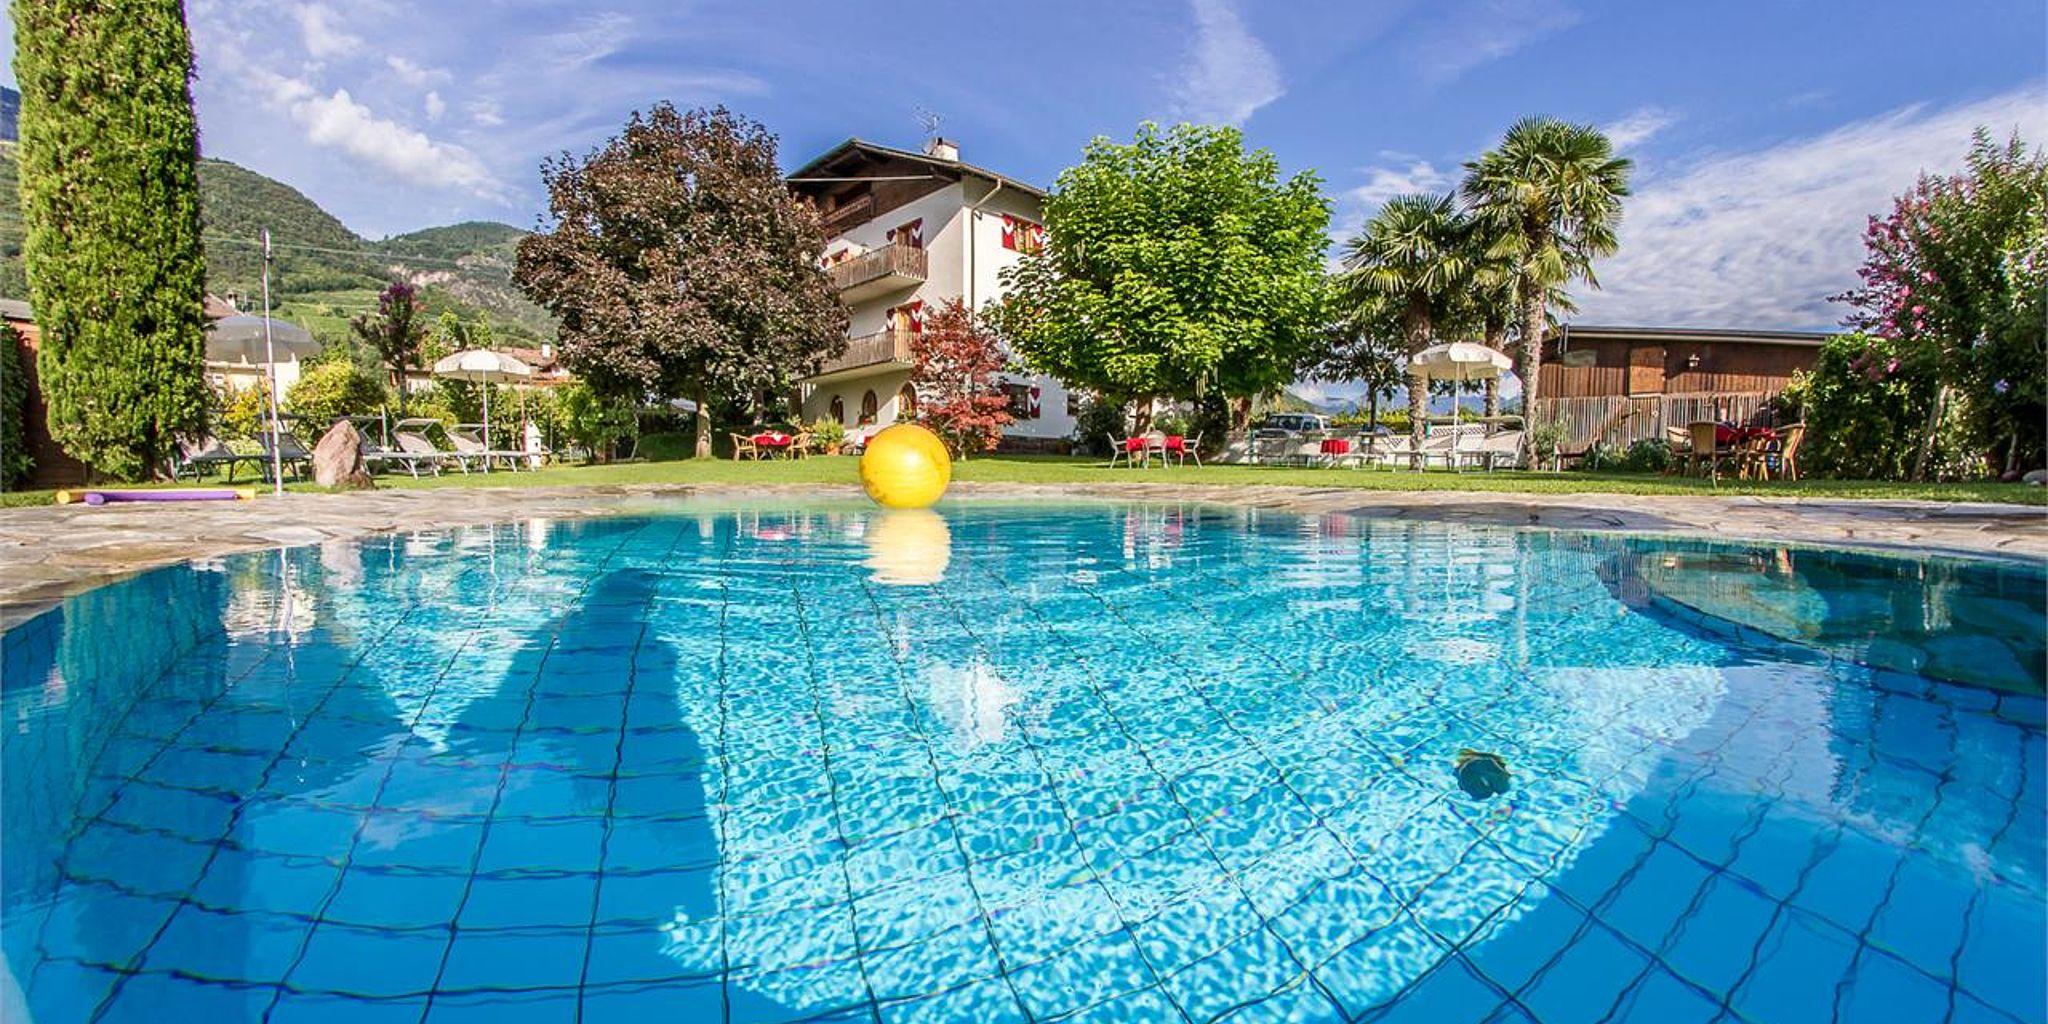 Hotels Kalterer See Und Umgebung